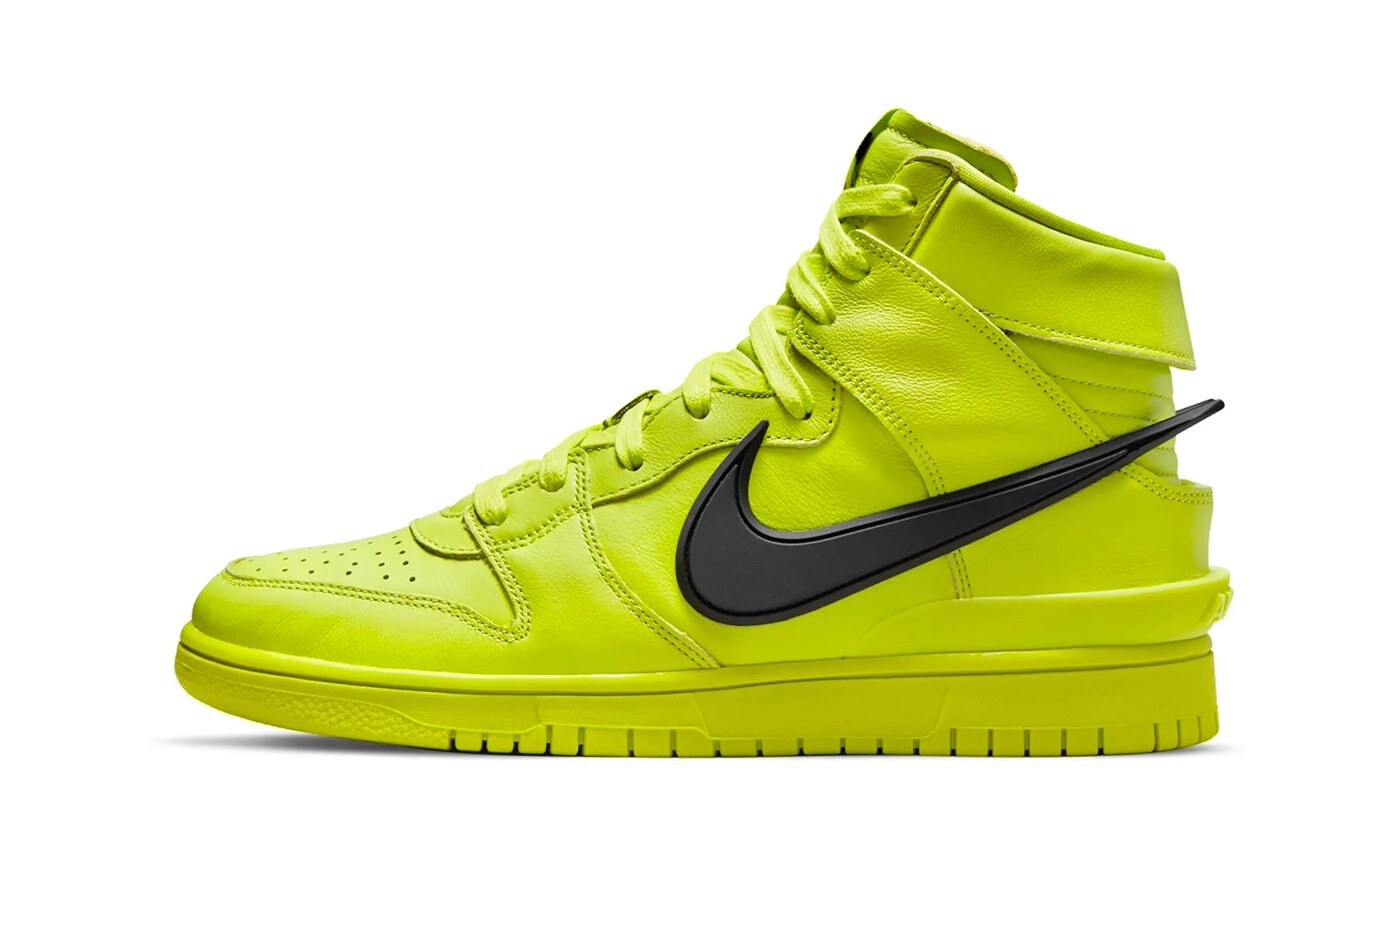 Ambush x Nike Dunk High Flash Lime